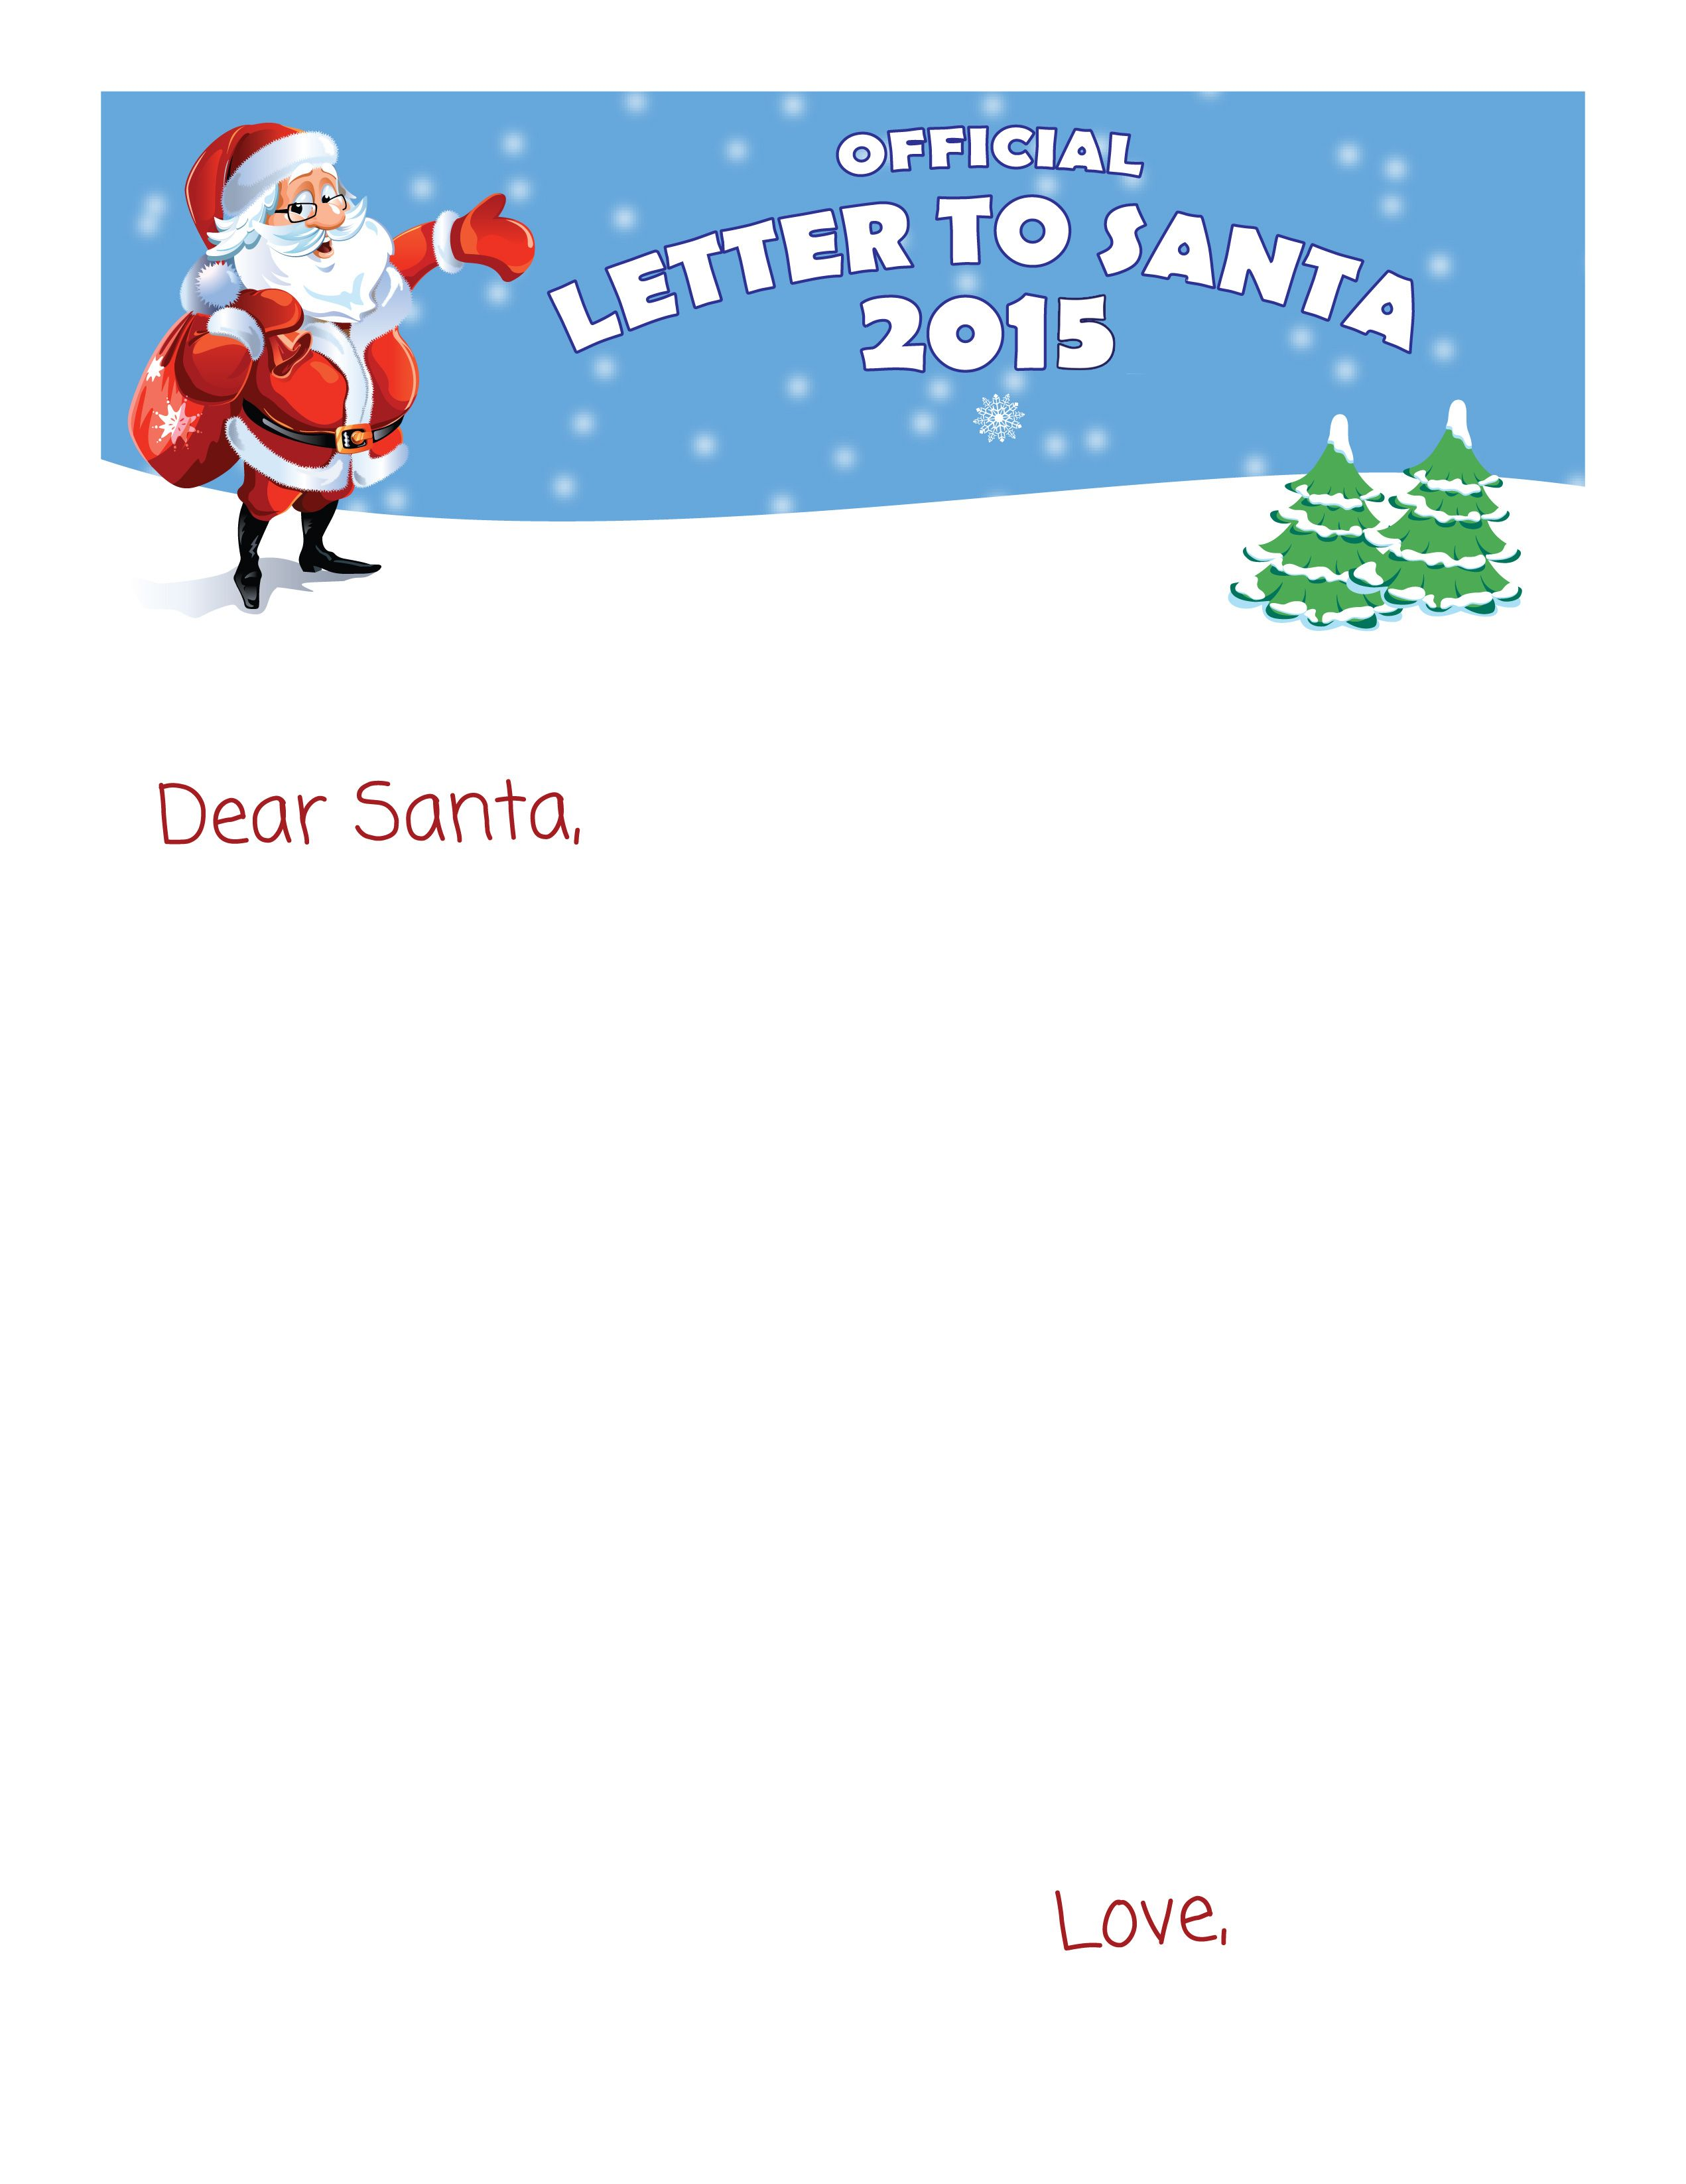 Easy Free Letter from Santa Magical Package Santa letter